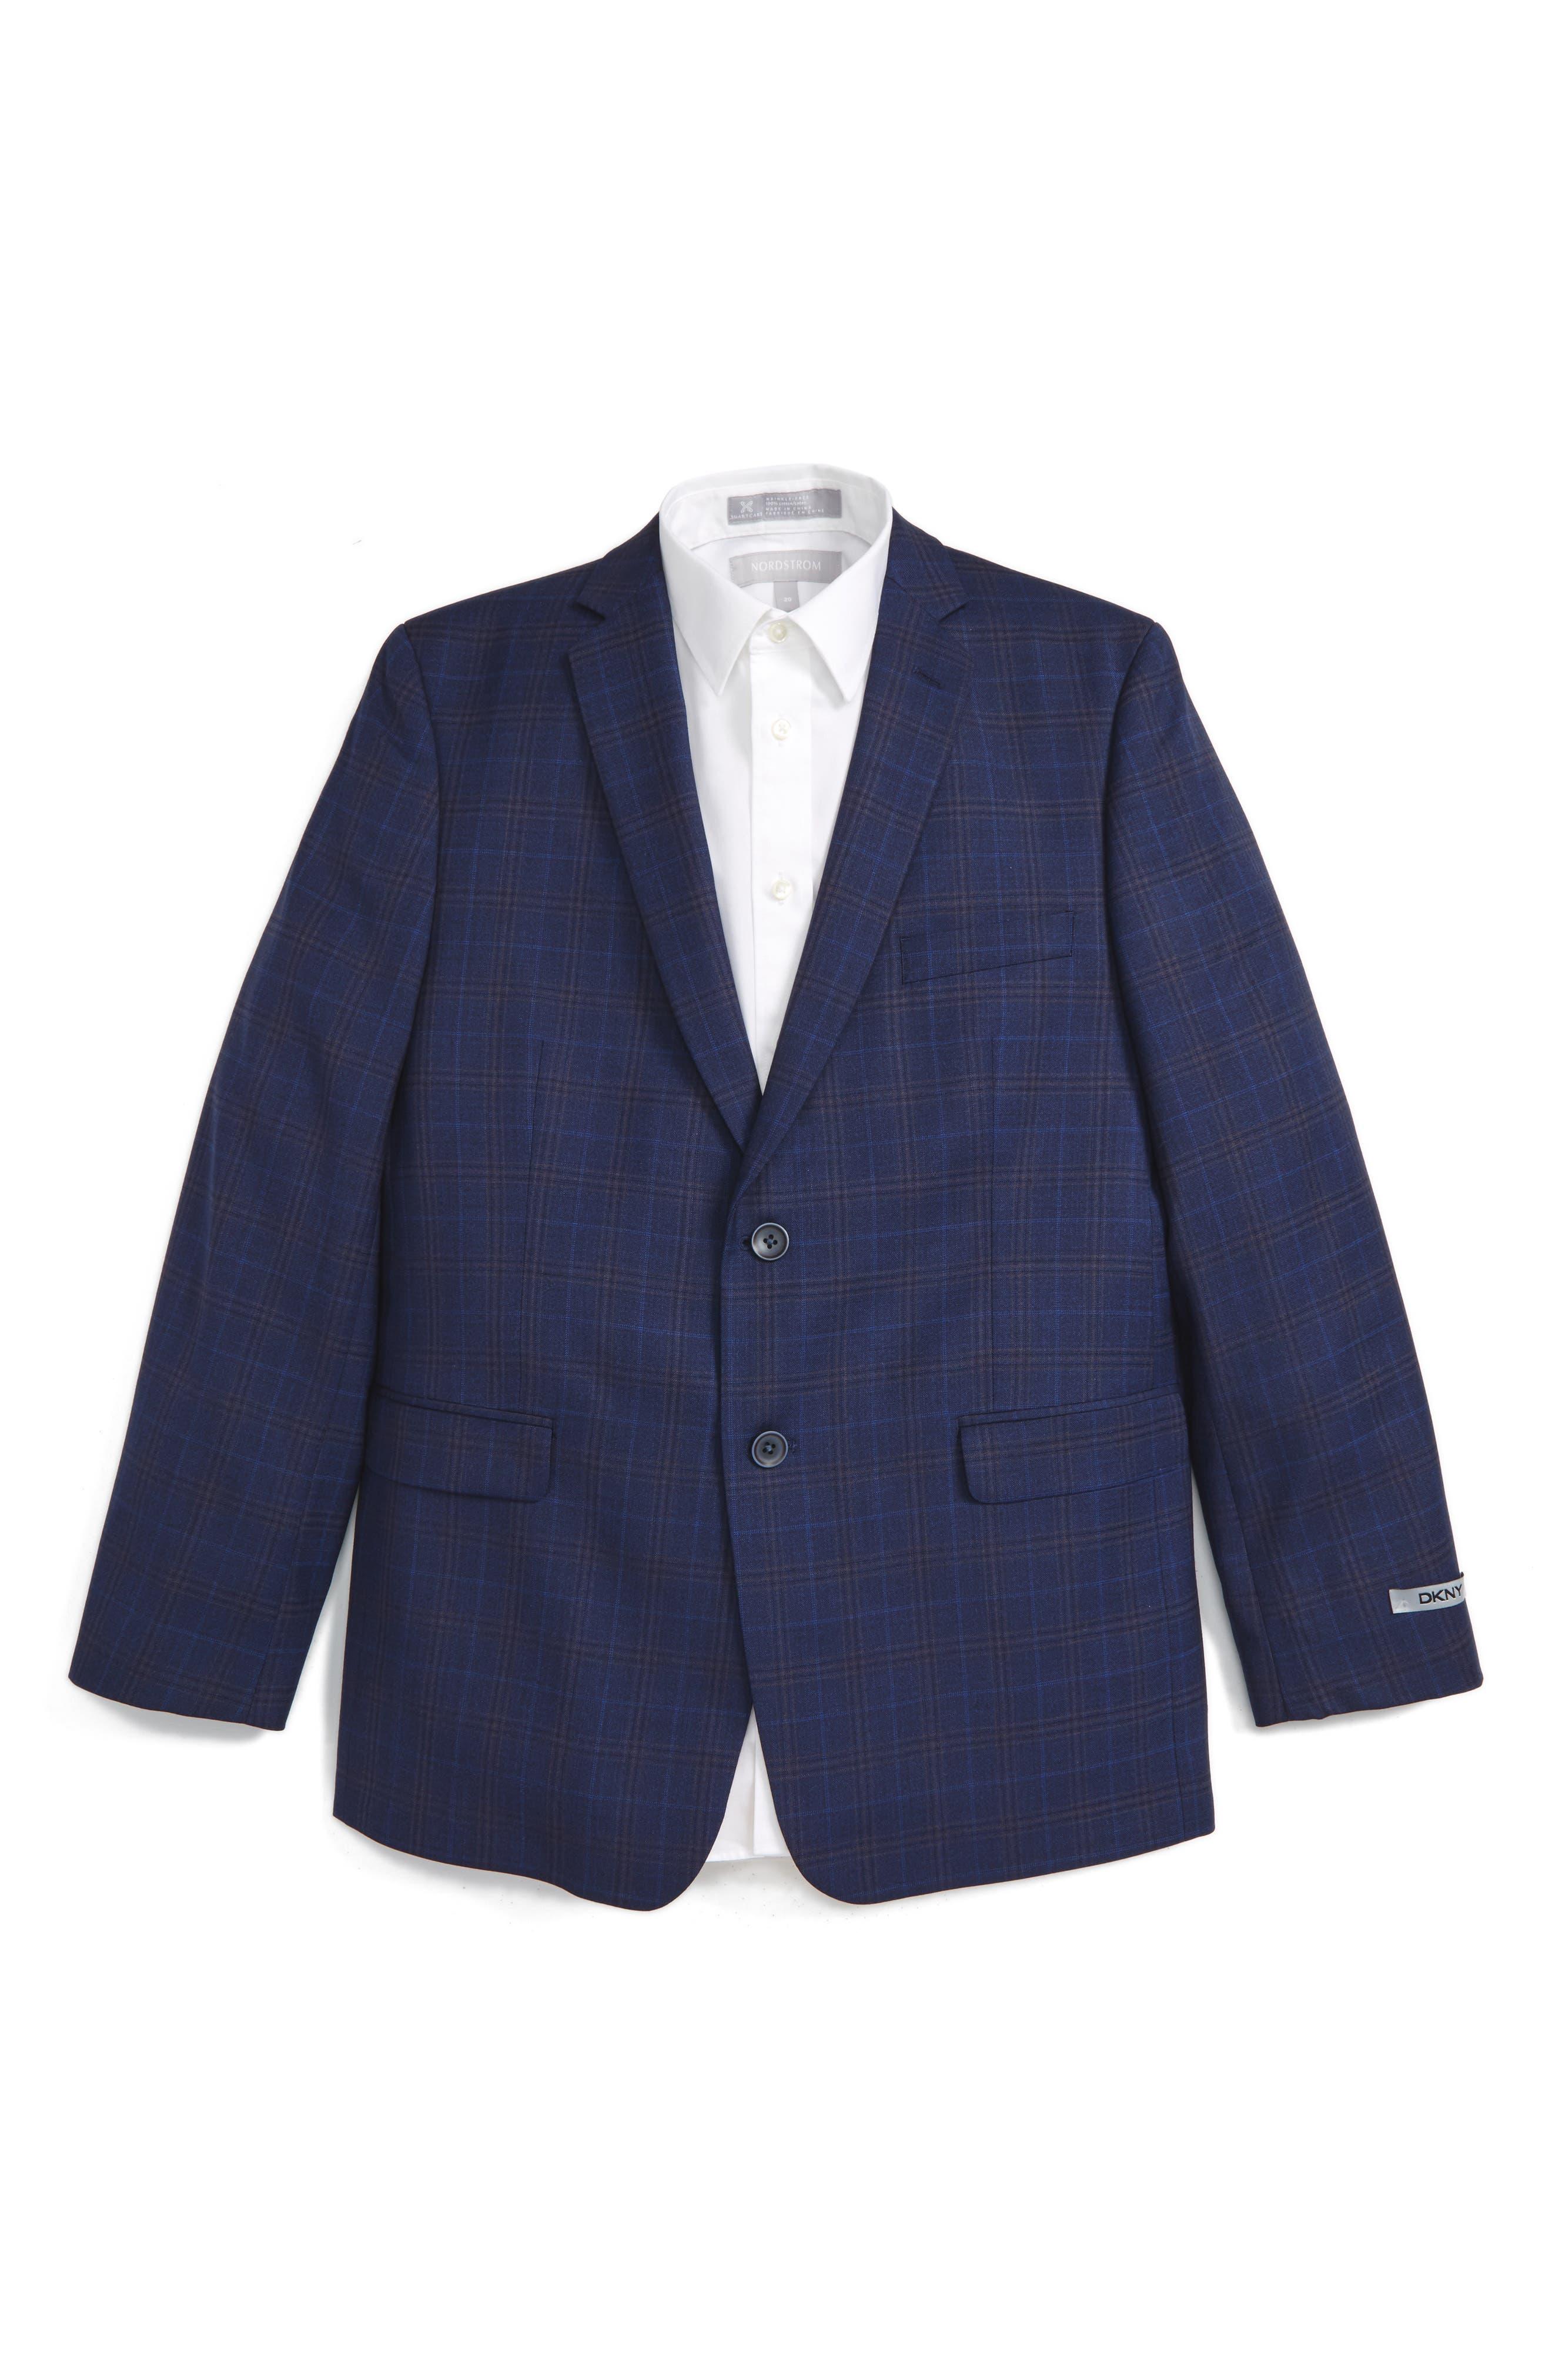 DKNY Check Wool Blazer